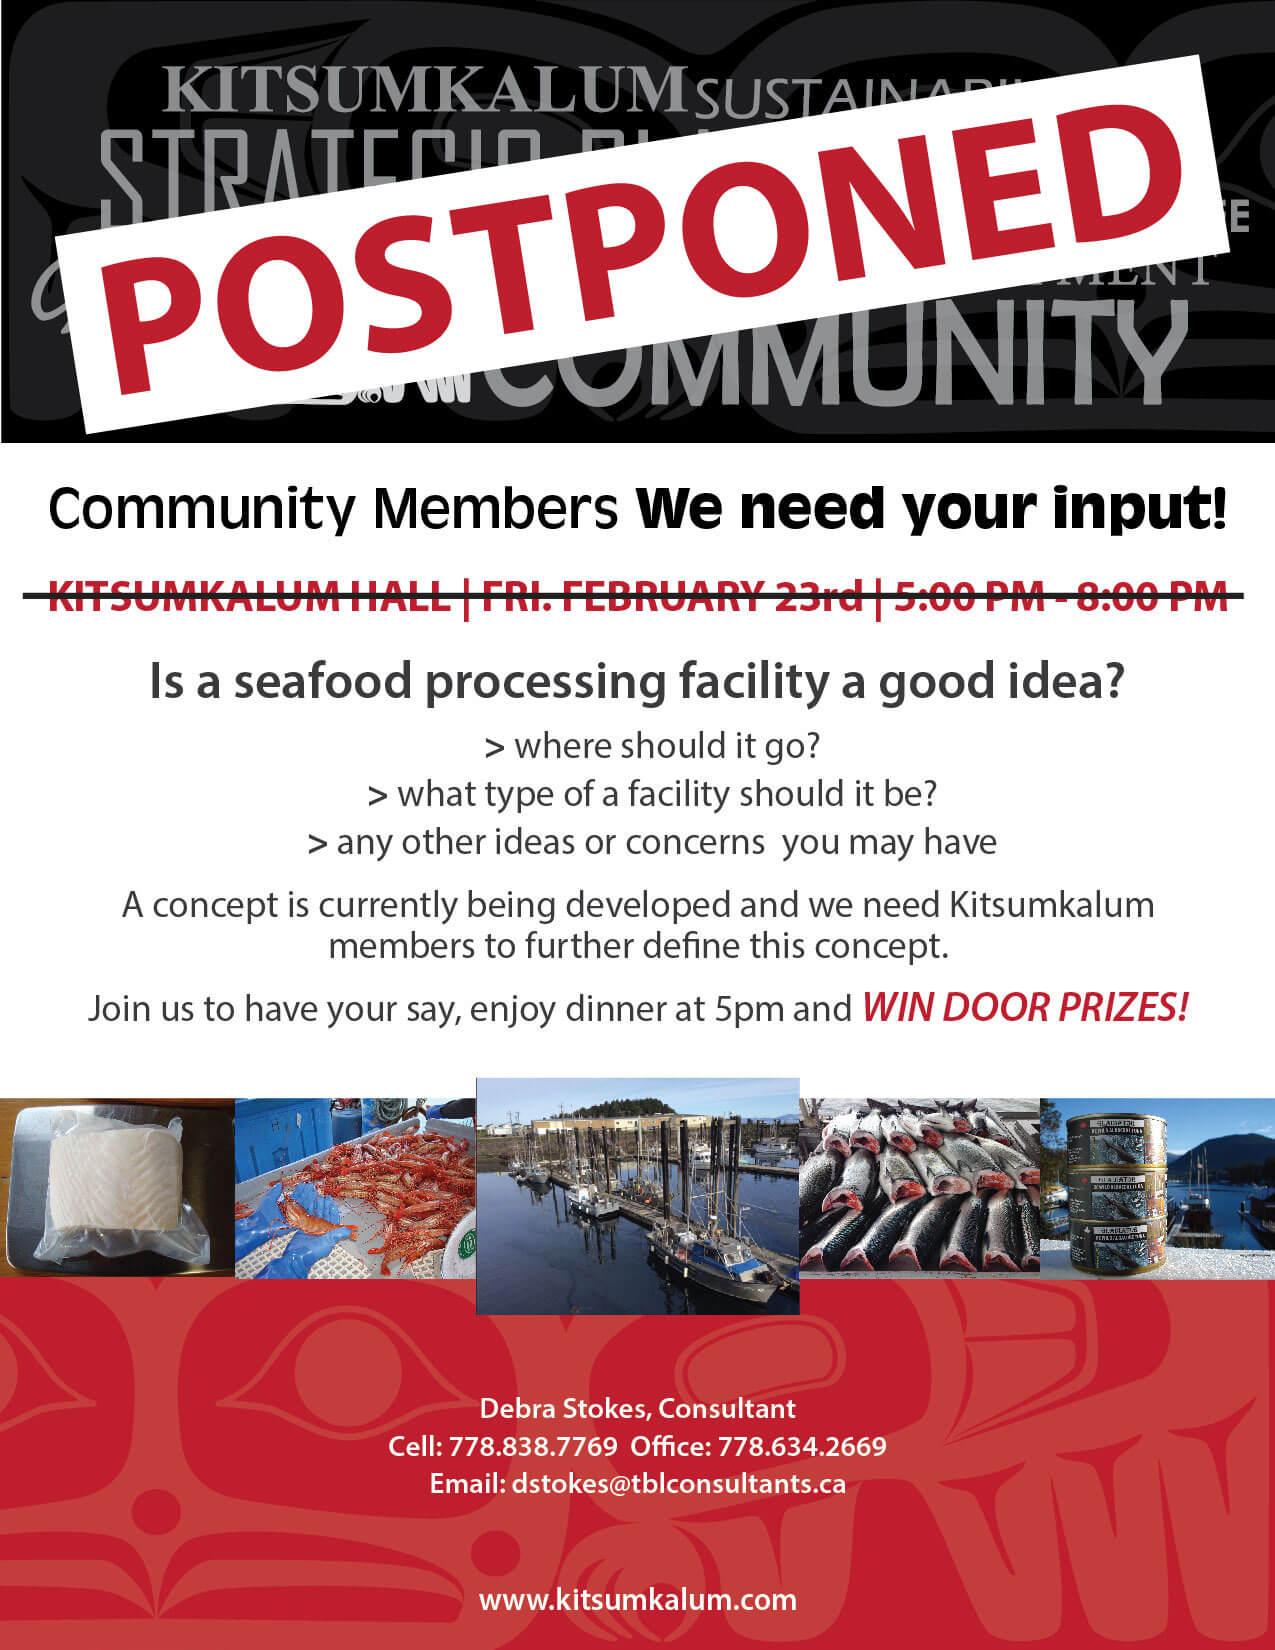 Community Input Needed – Feb. 23rd